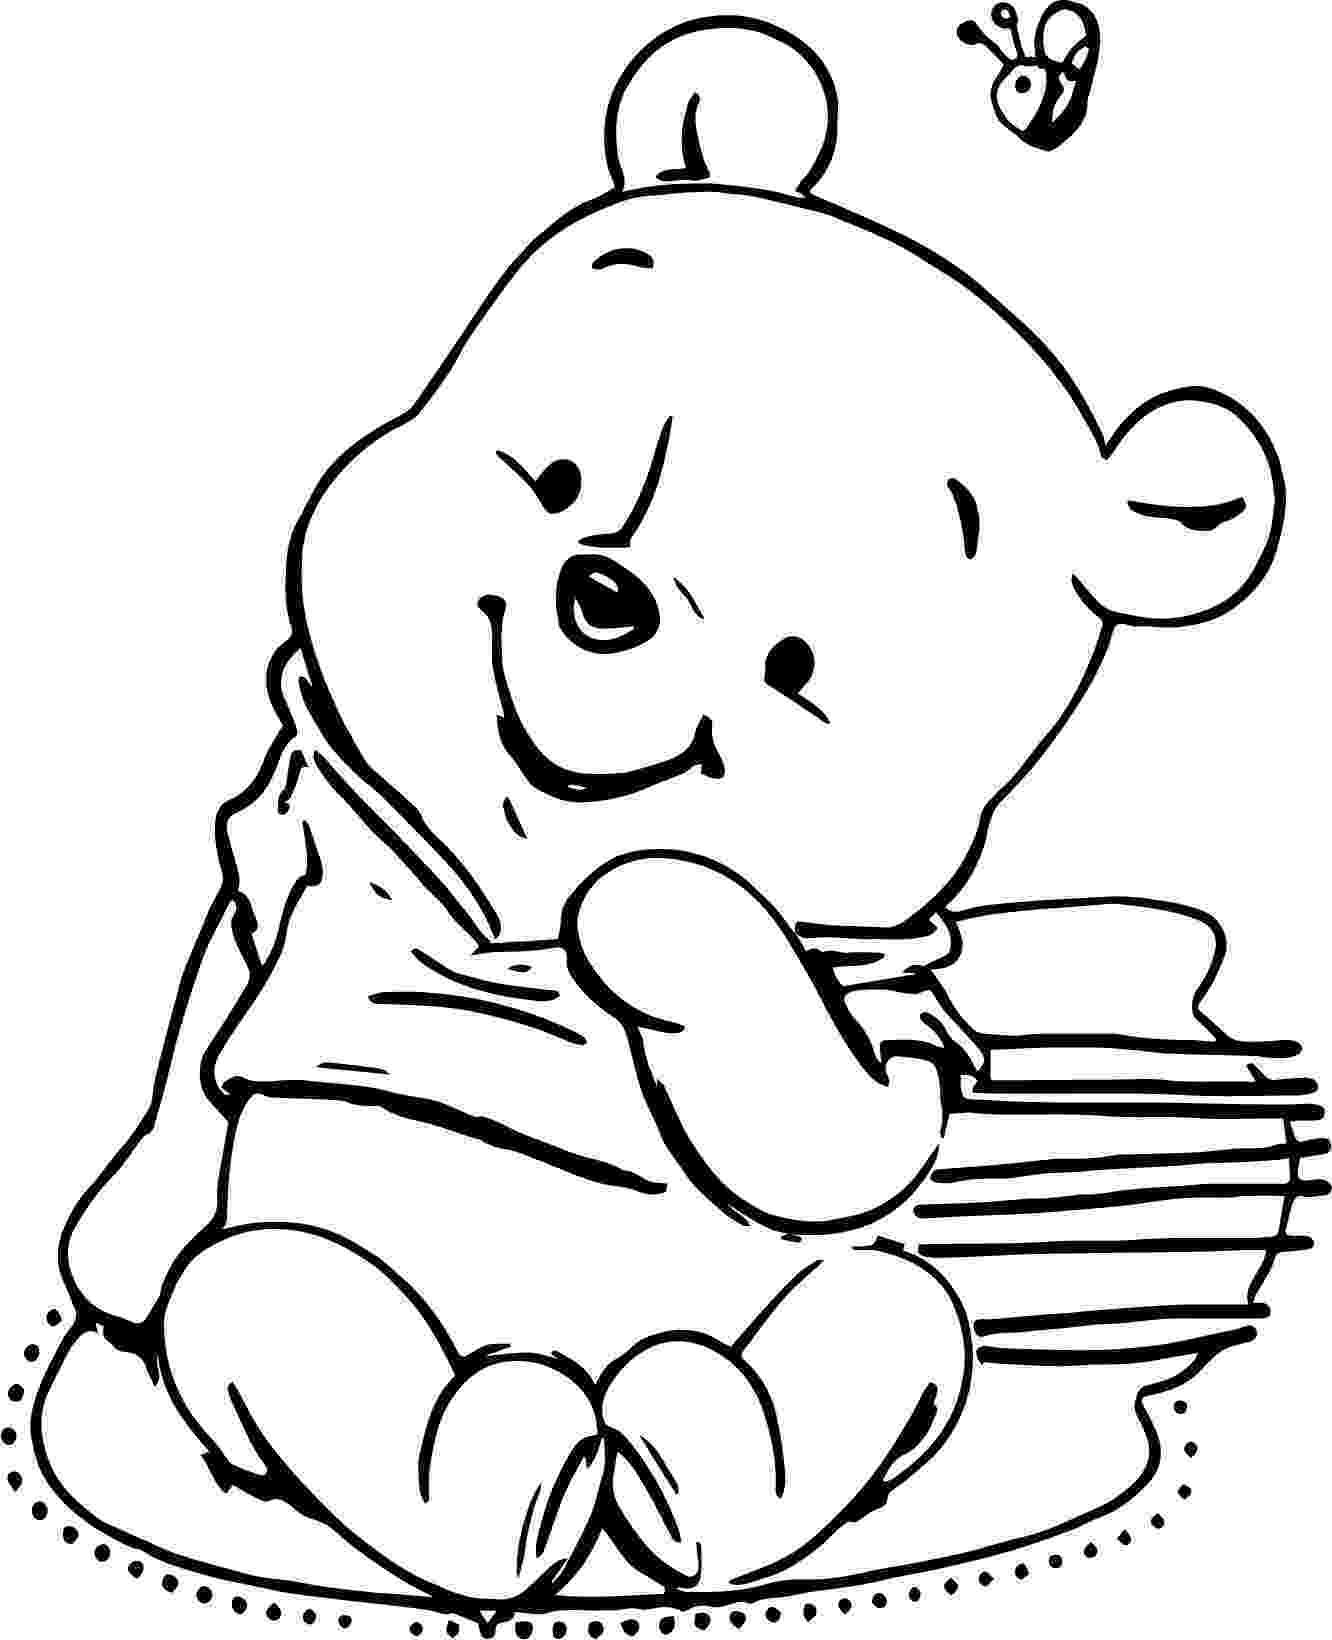 winnie the pooh template wacky wednesday 3 january 18 is winnie the pooh day winnie the pooh template